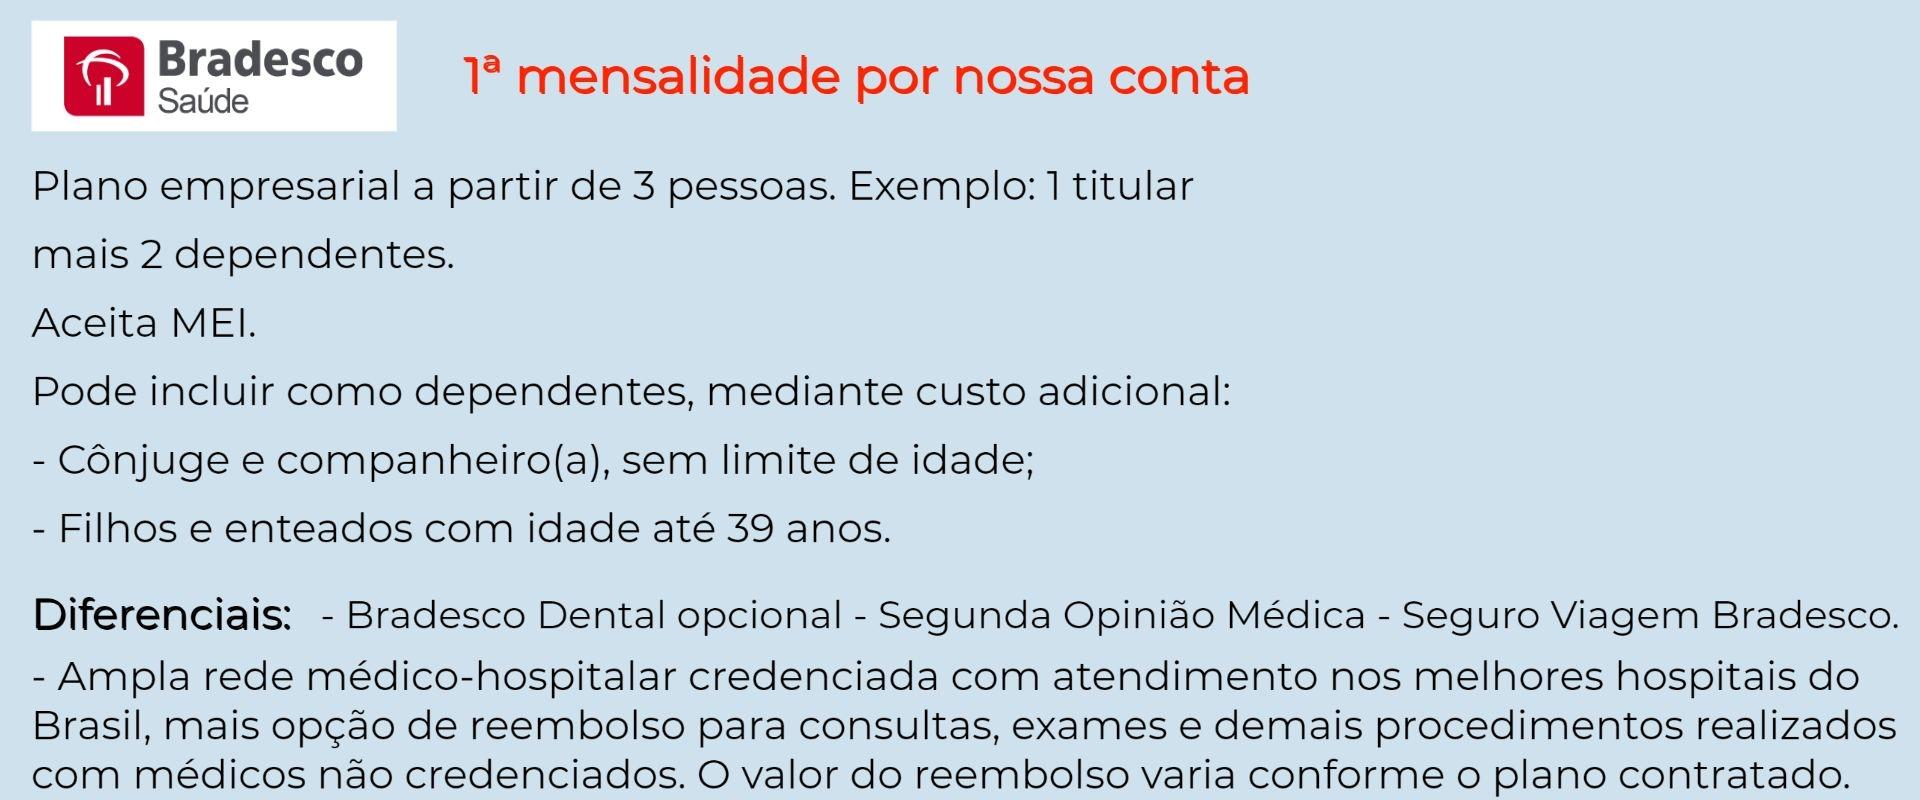 Bradesco Saúde Empresarial - Aparecida